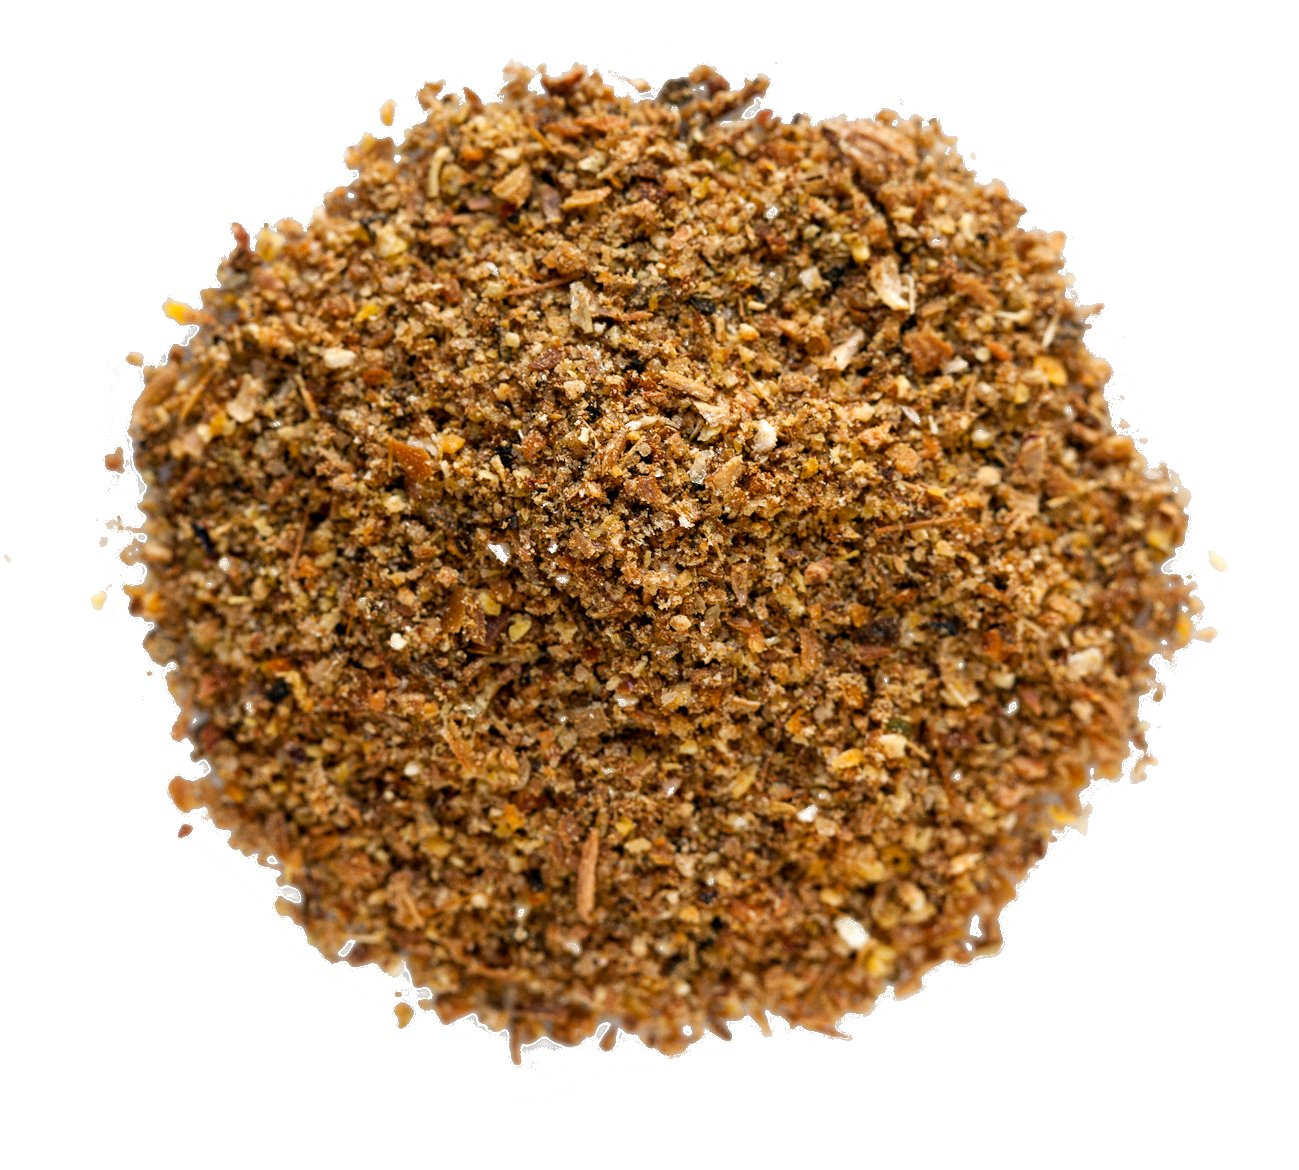 World Spice Merchants - Seattle Salmon Rub, Ground, 8 oz. Bag